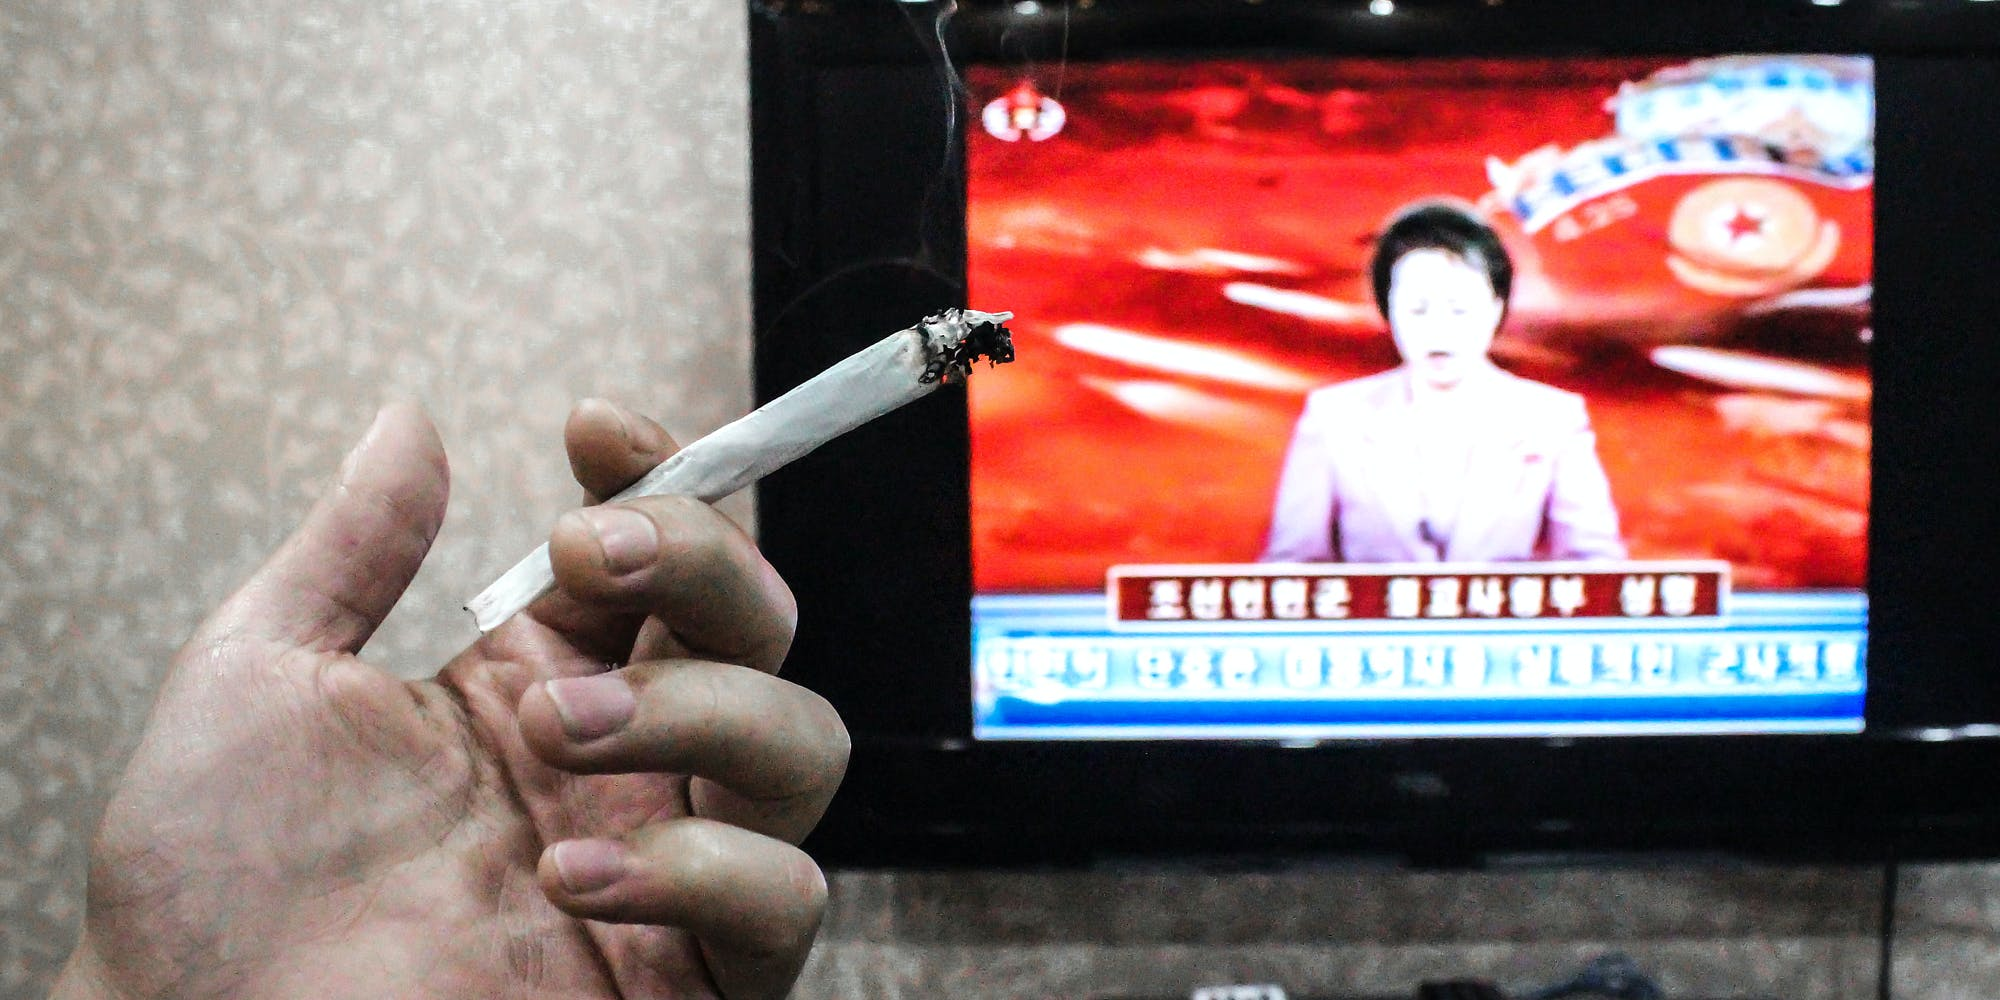 Rare Photos Of Weed Smoking In North Korea